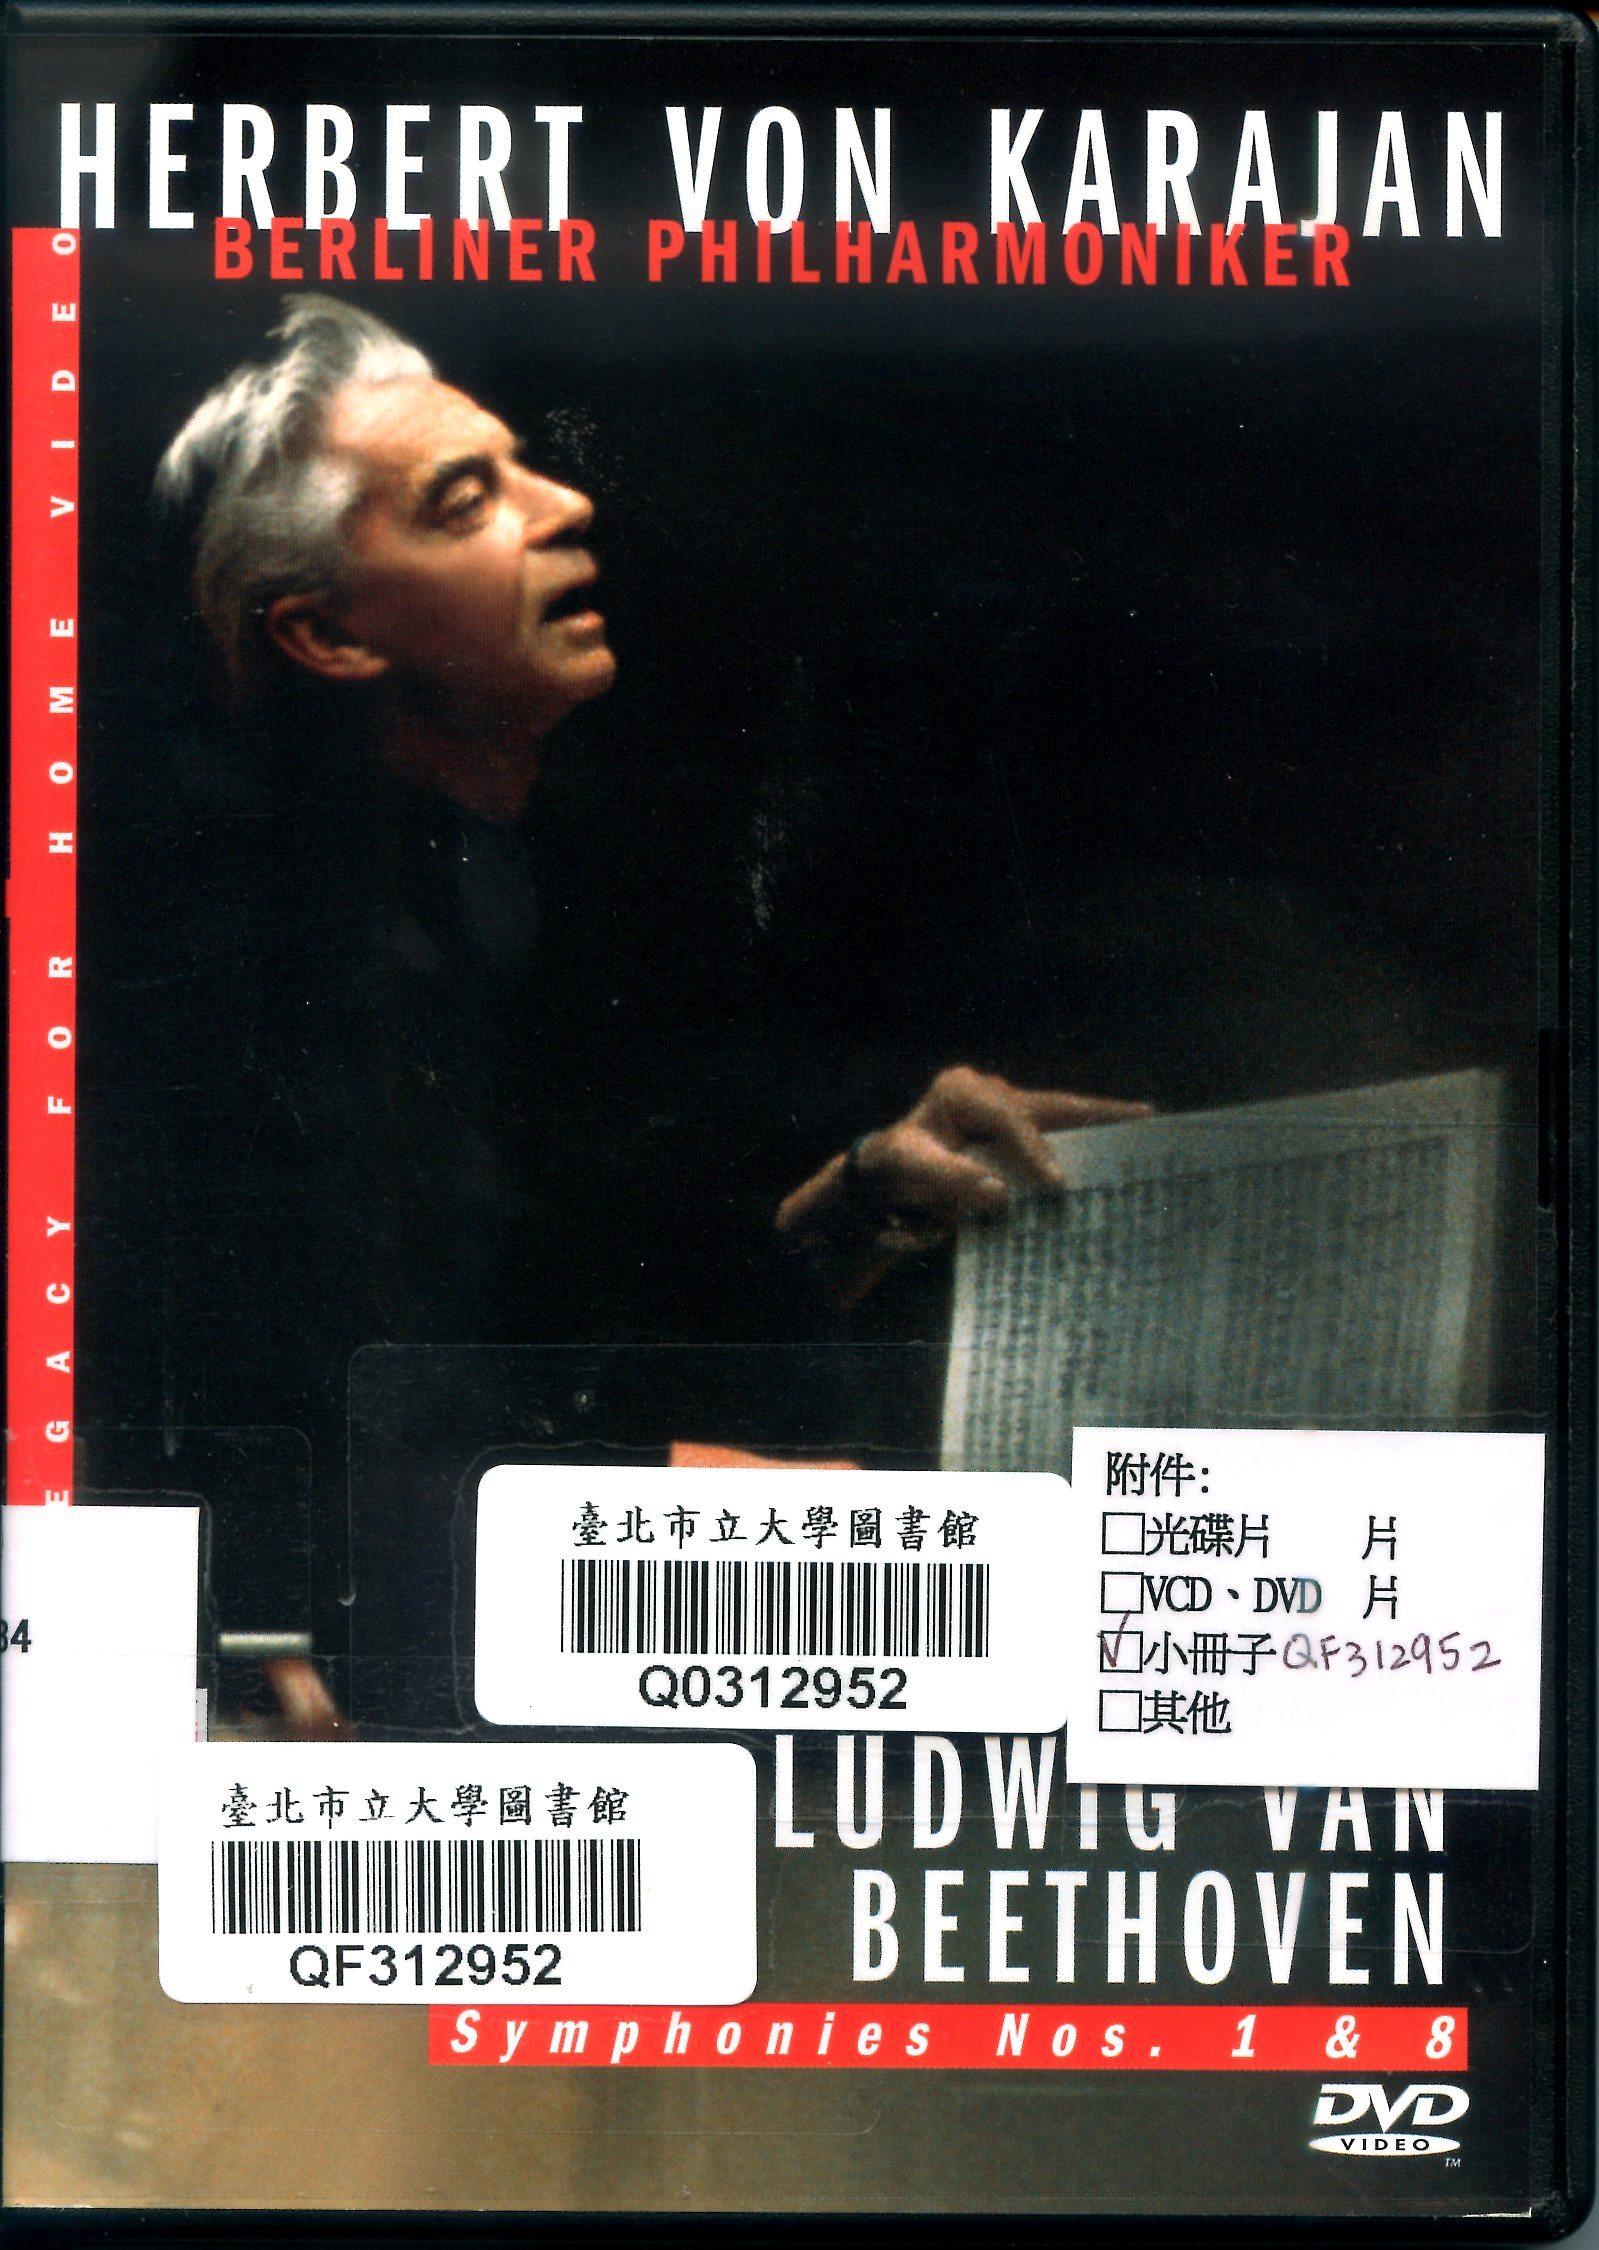 Beethoven(家用版) Symphonies nos. 1-9 = 貝多芬 : 九大交響曲全集 /